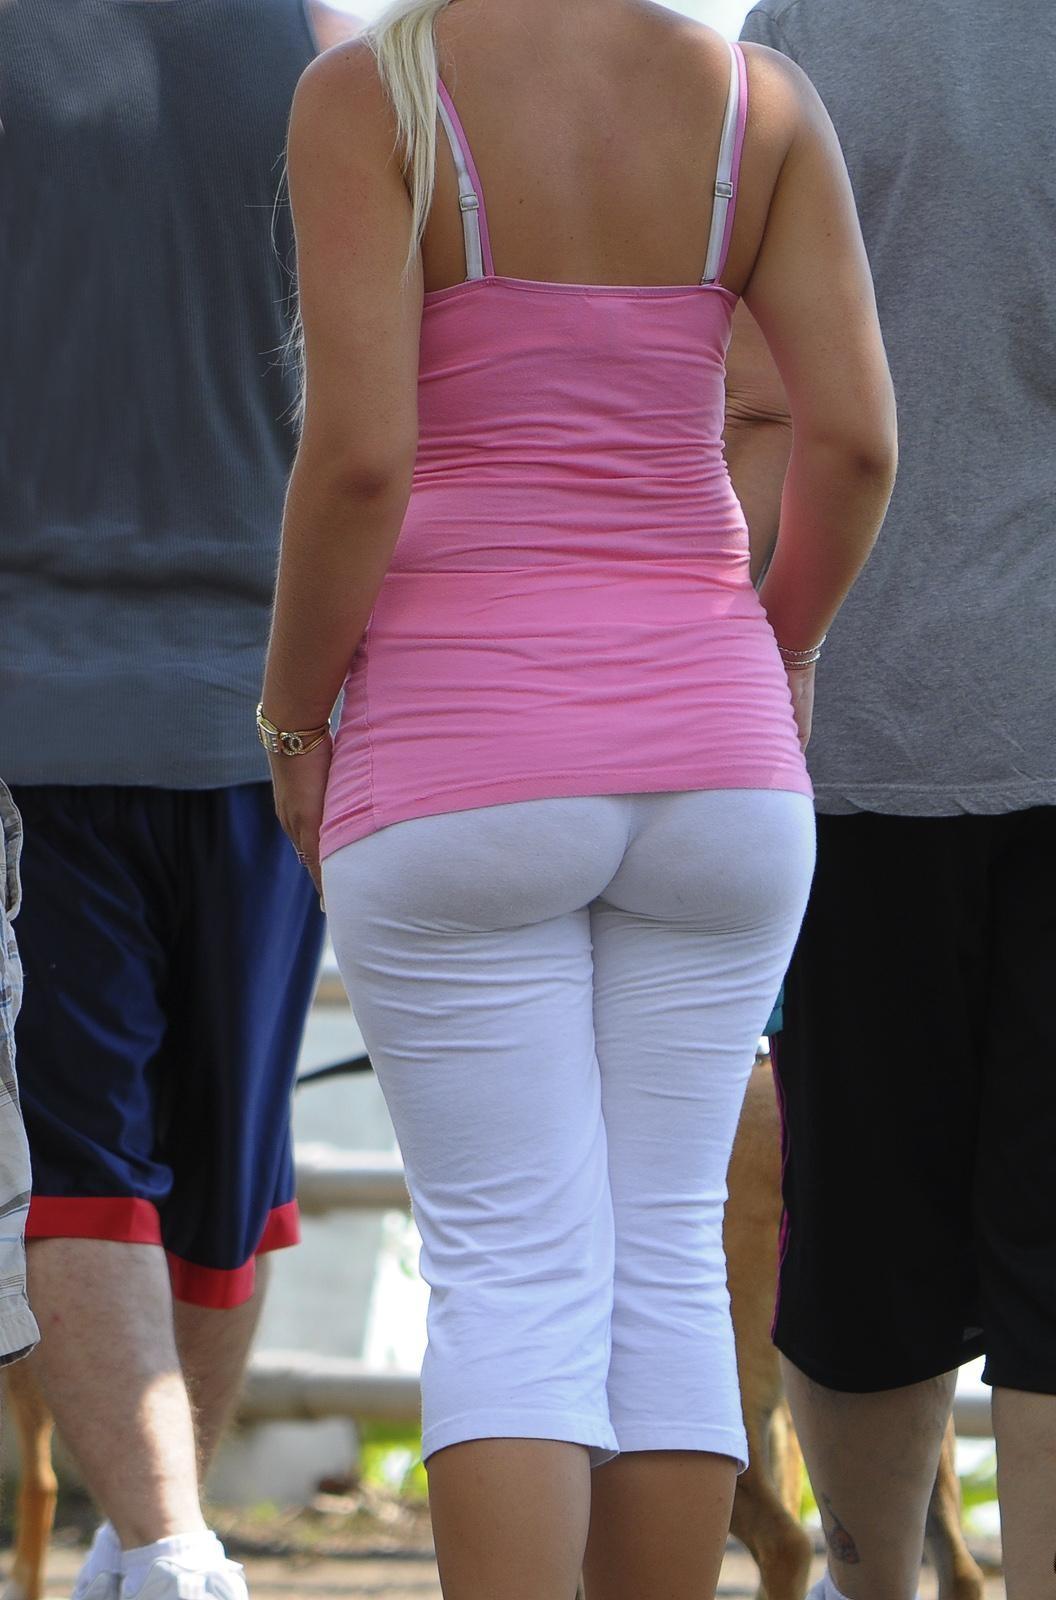 big round ass stretch pants